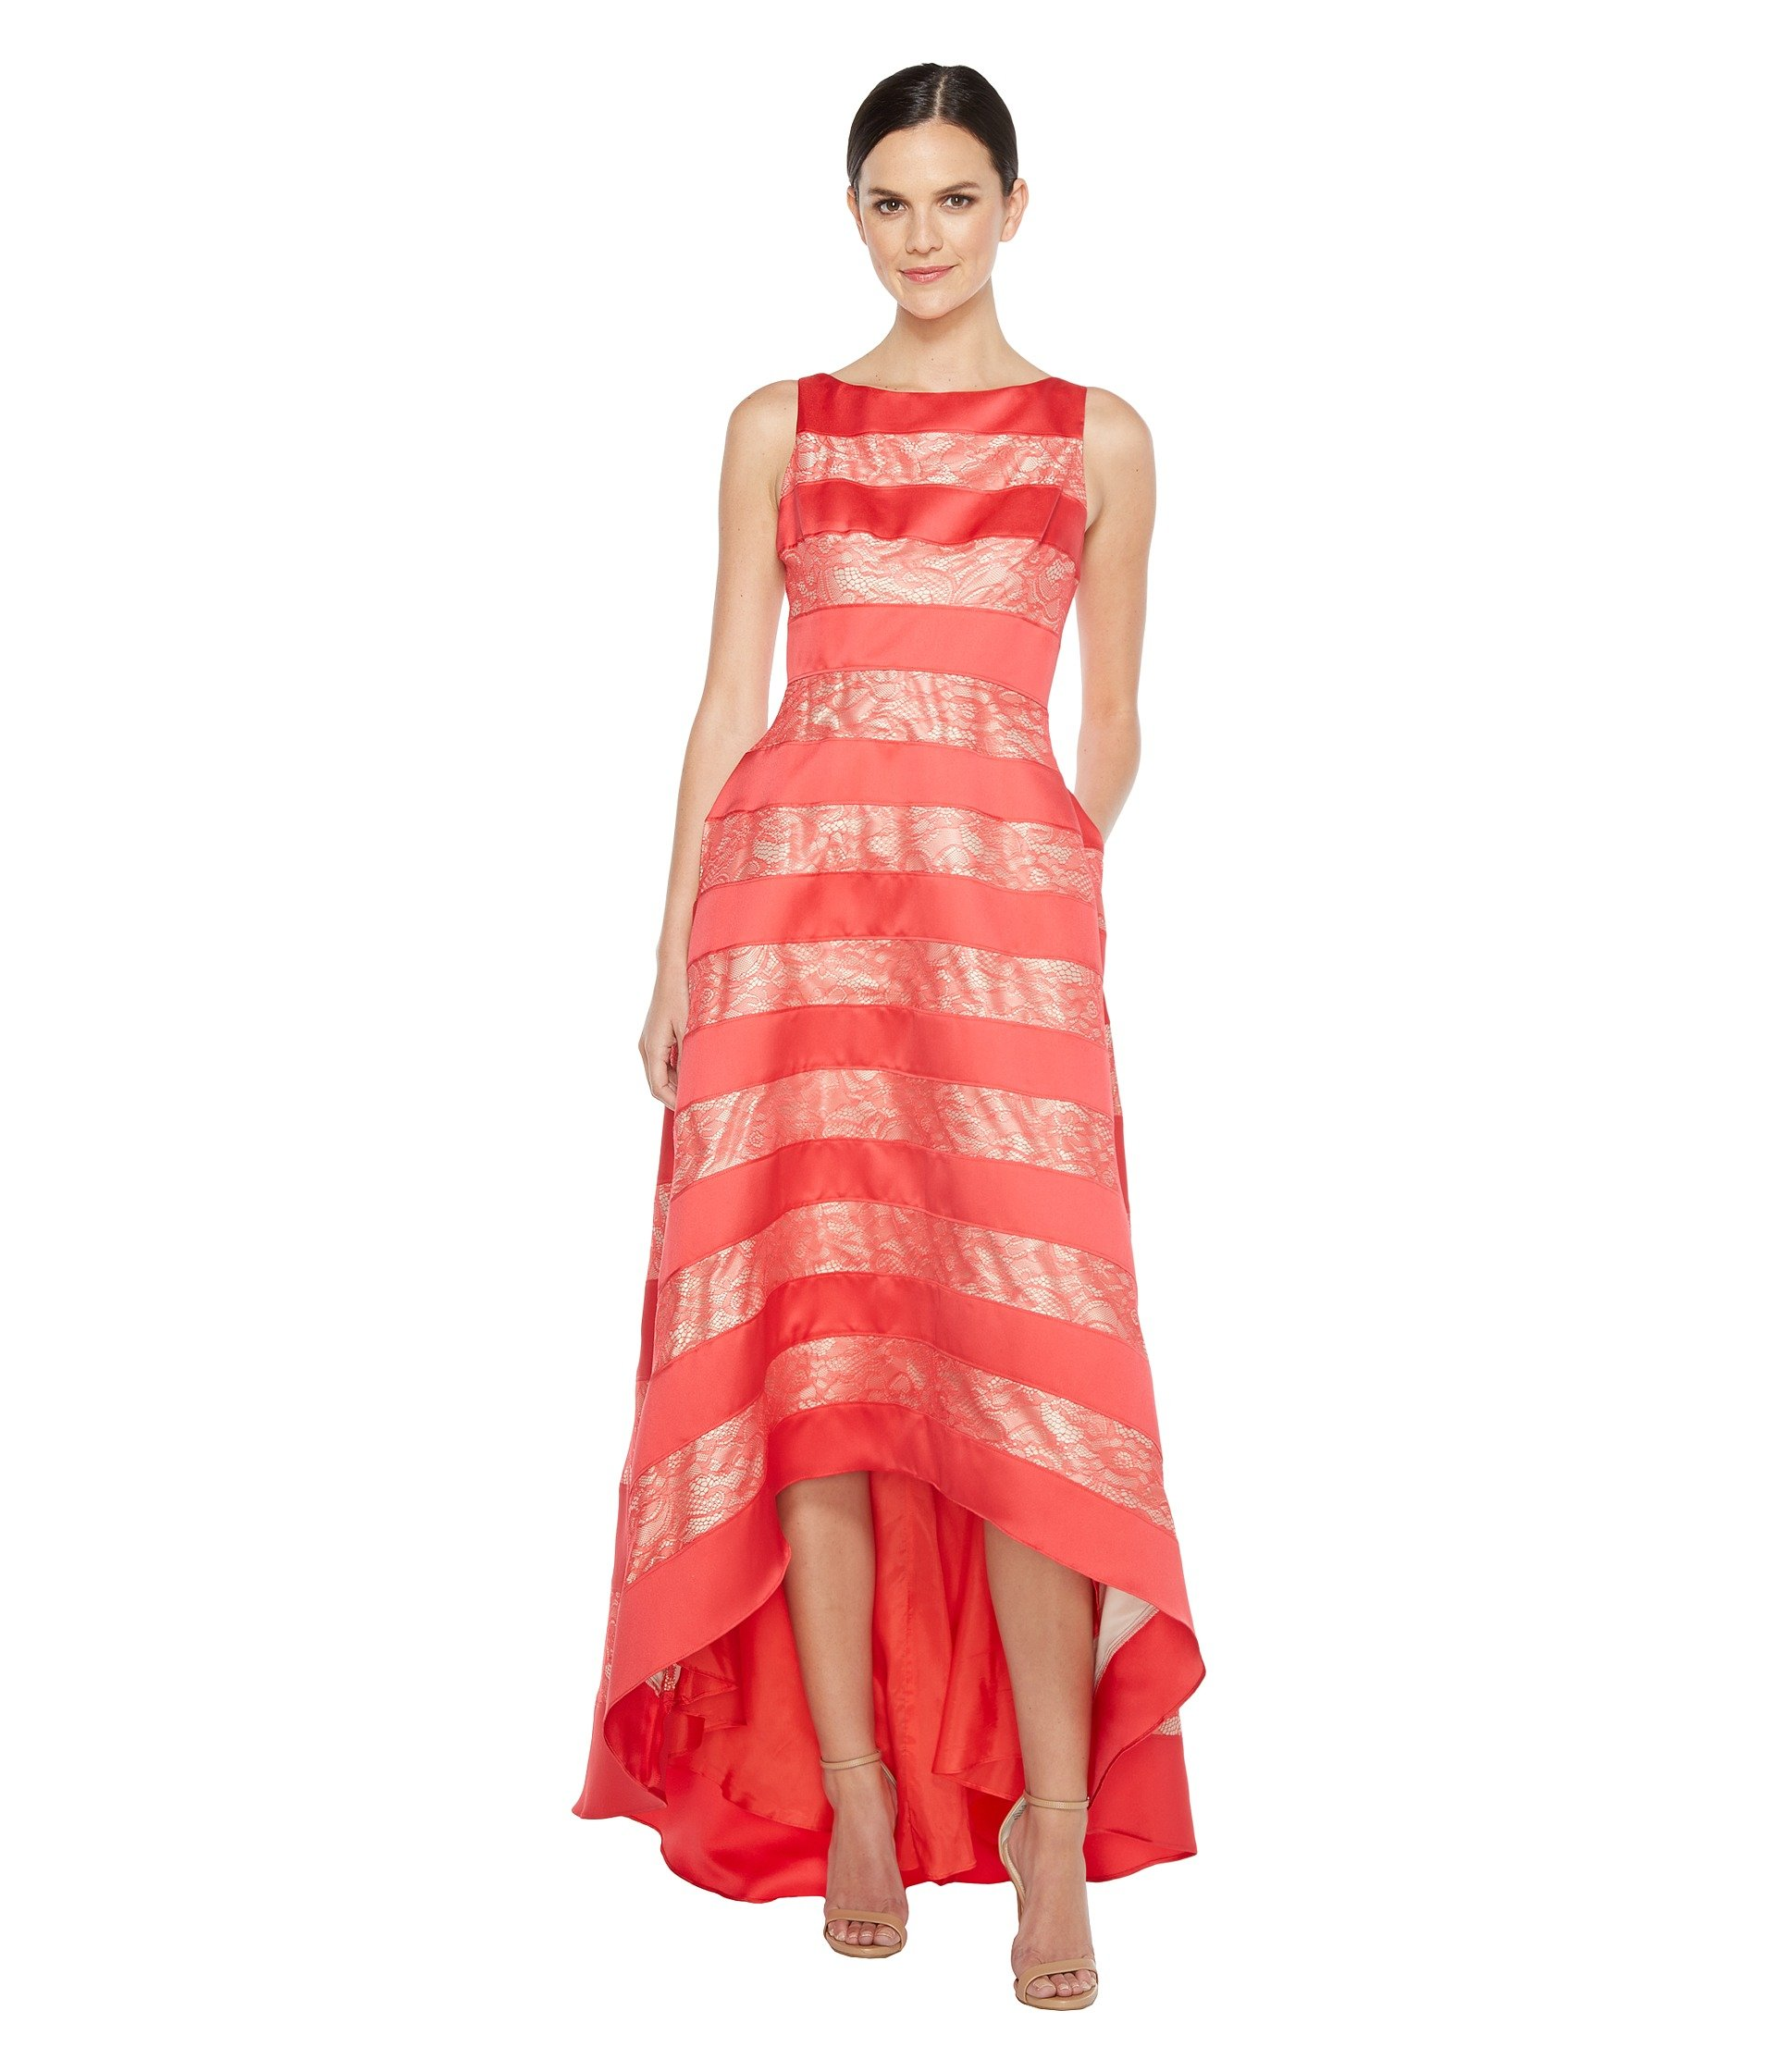 Adrianna Papell Women's Striped Lace & Mikado Hi-low Dress Hot Tomato 4